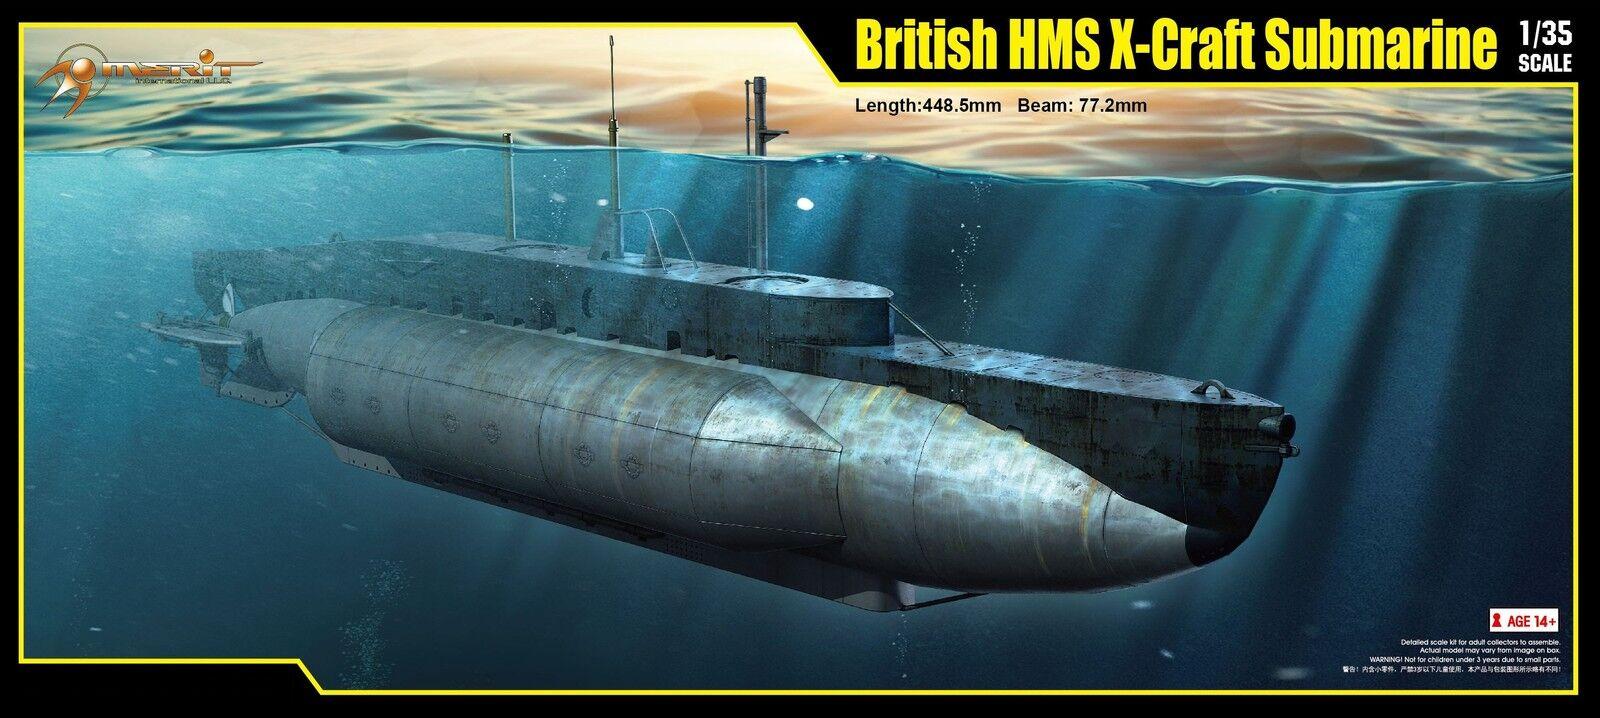 SOUS-MARIN BRITANNIQUE HMS X-CRAFT, WW2 - kit MERIT INTERNATIONAL 1 35 n° 63504